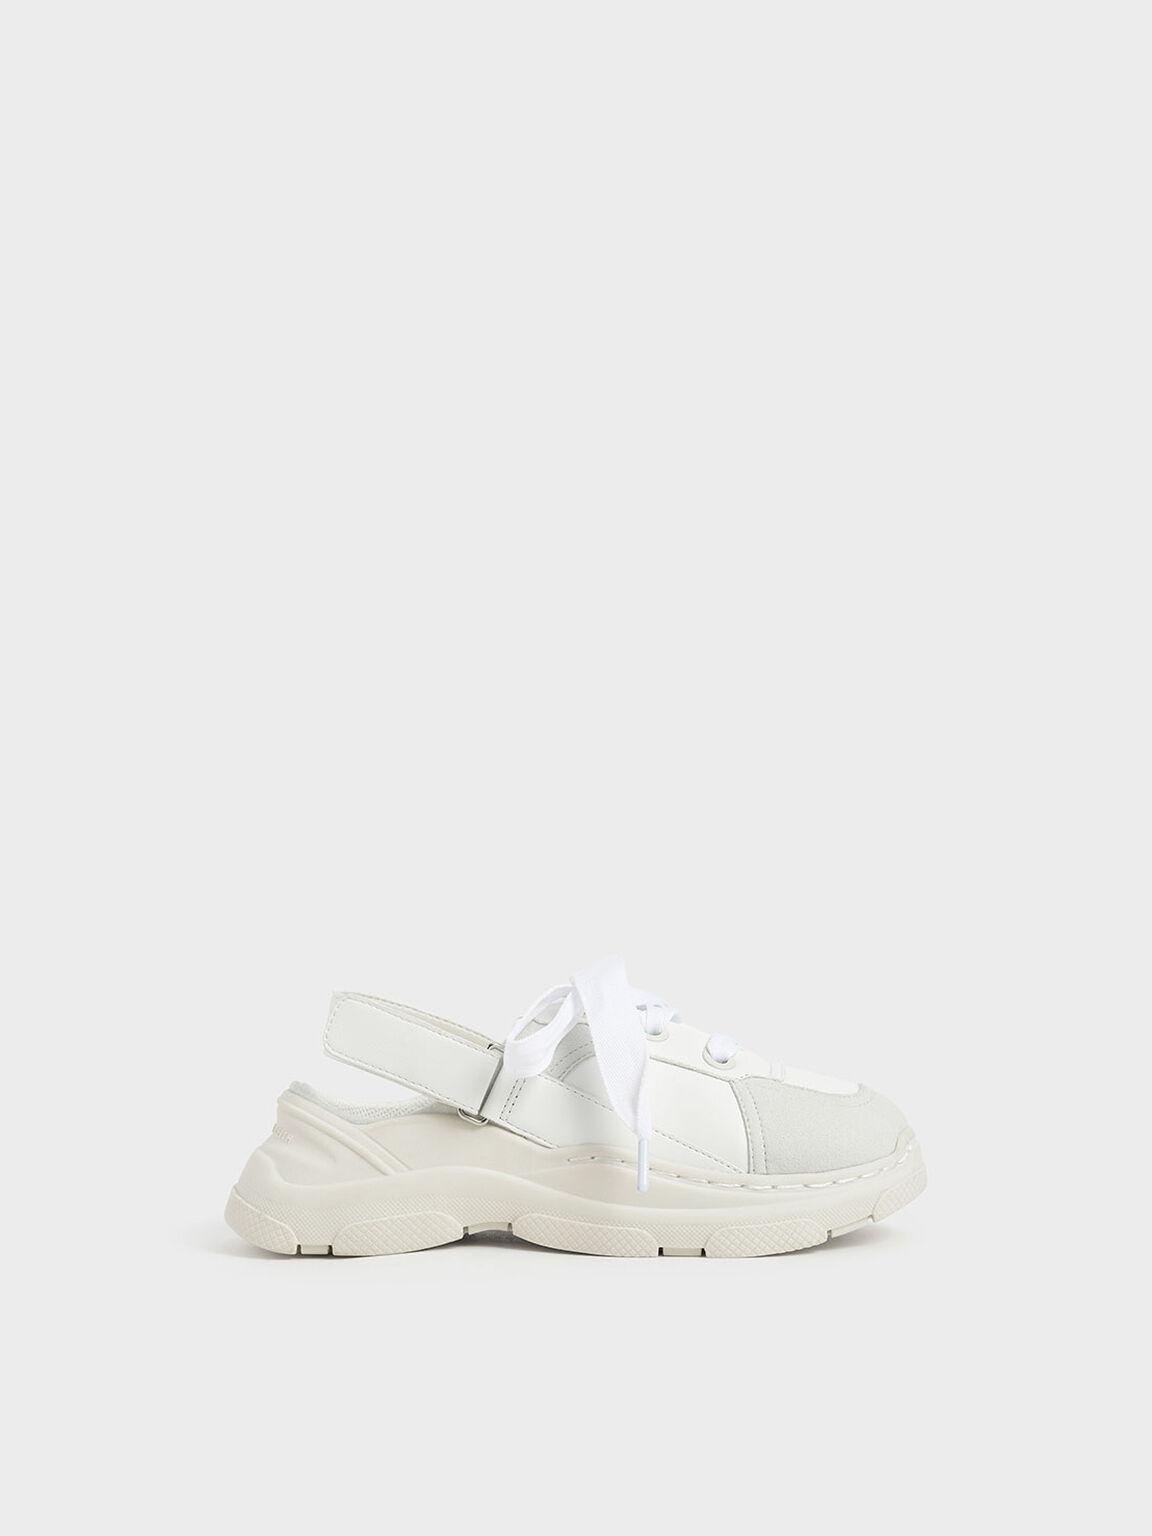 Sepatu Slingback Anak Perempuan, White, hi-res